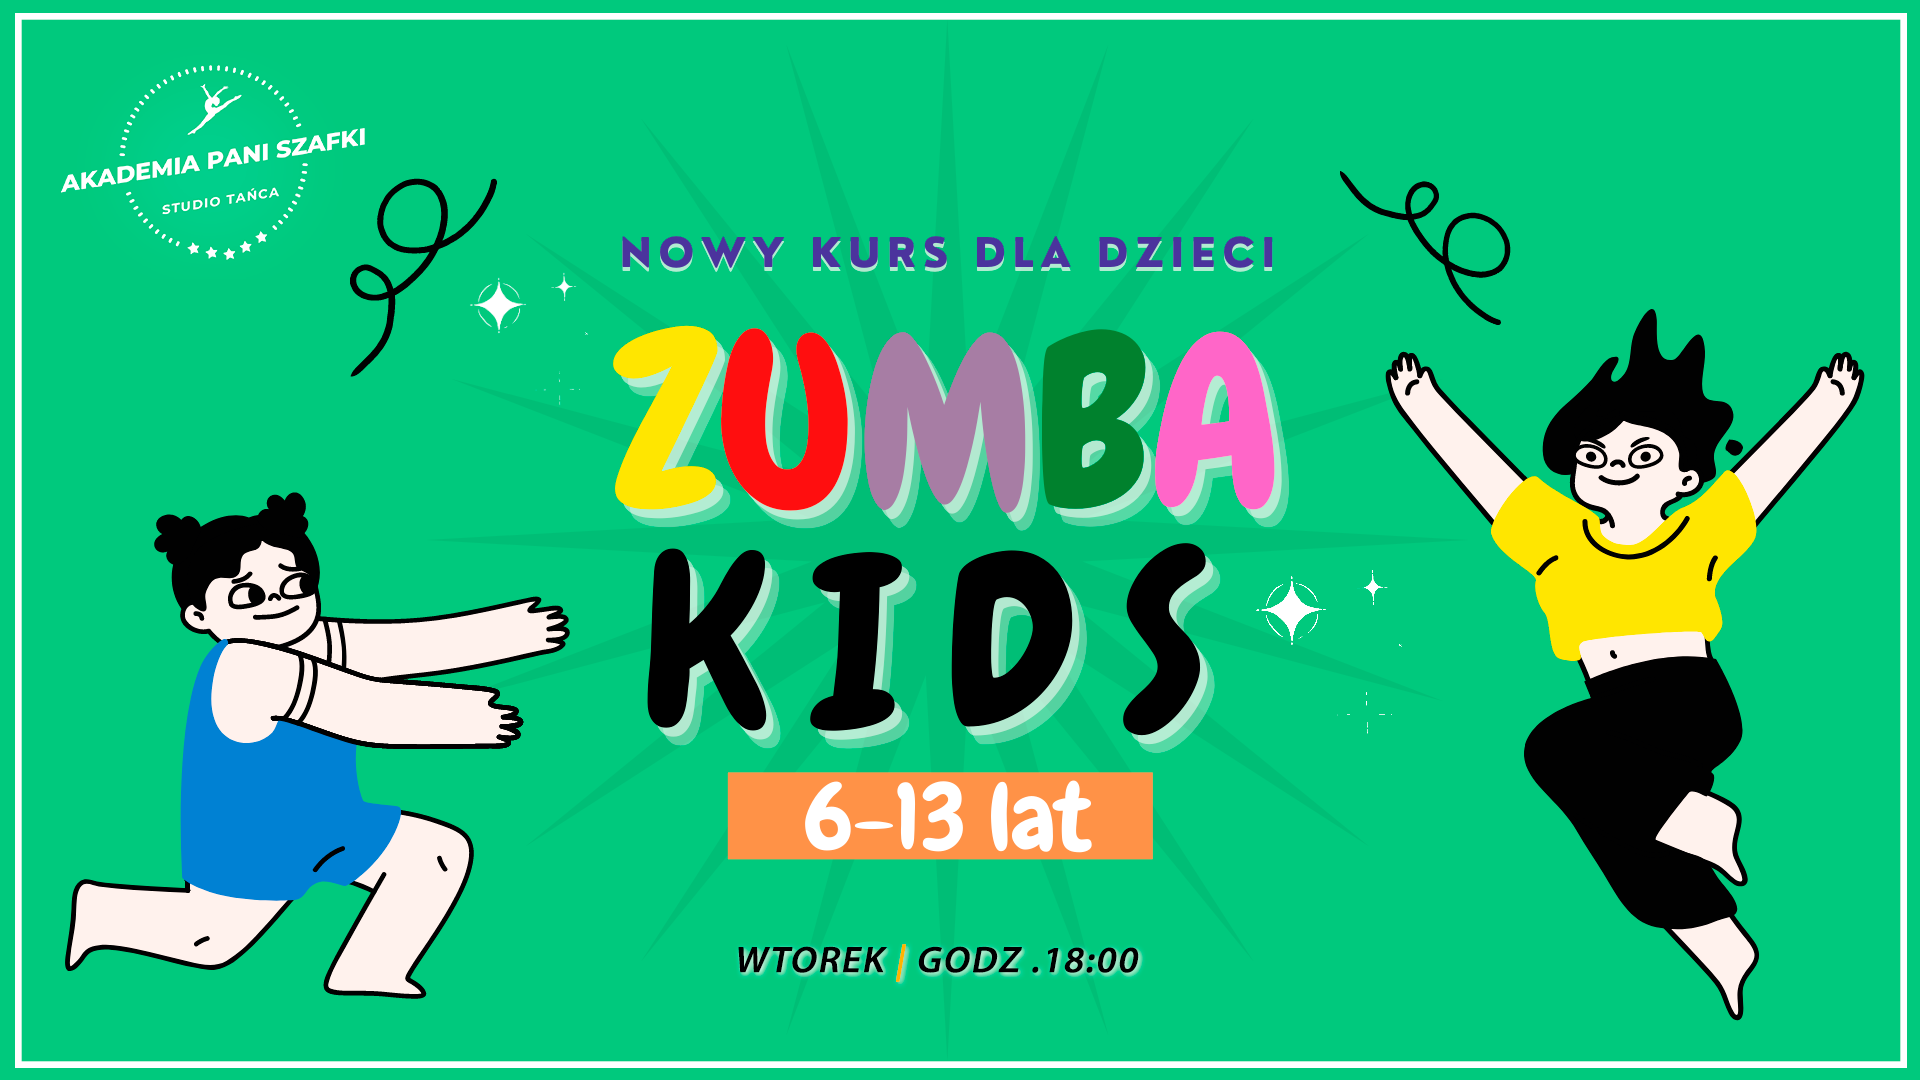 Zumba dla dzieci wMarkach. Zumba Kids wAkademia Pani Szafki